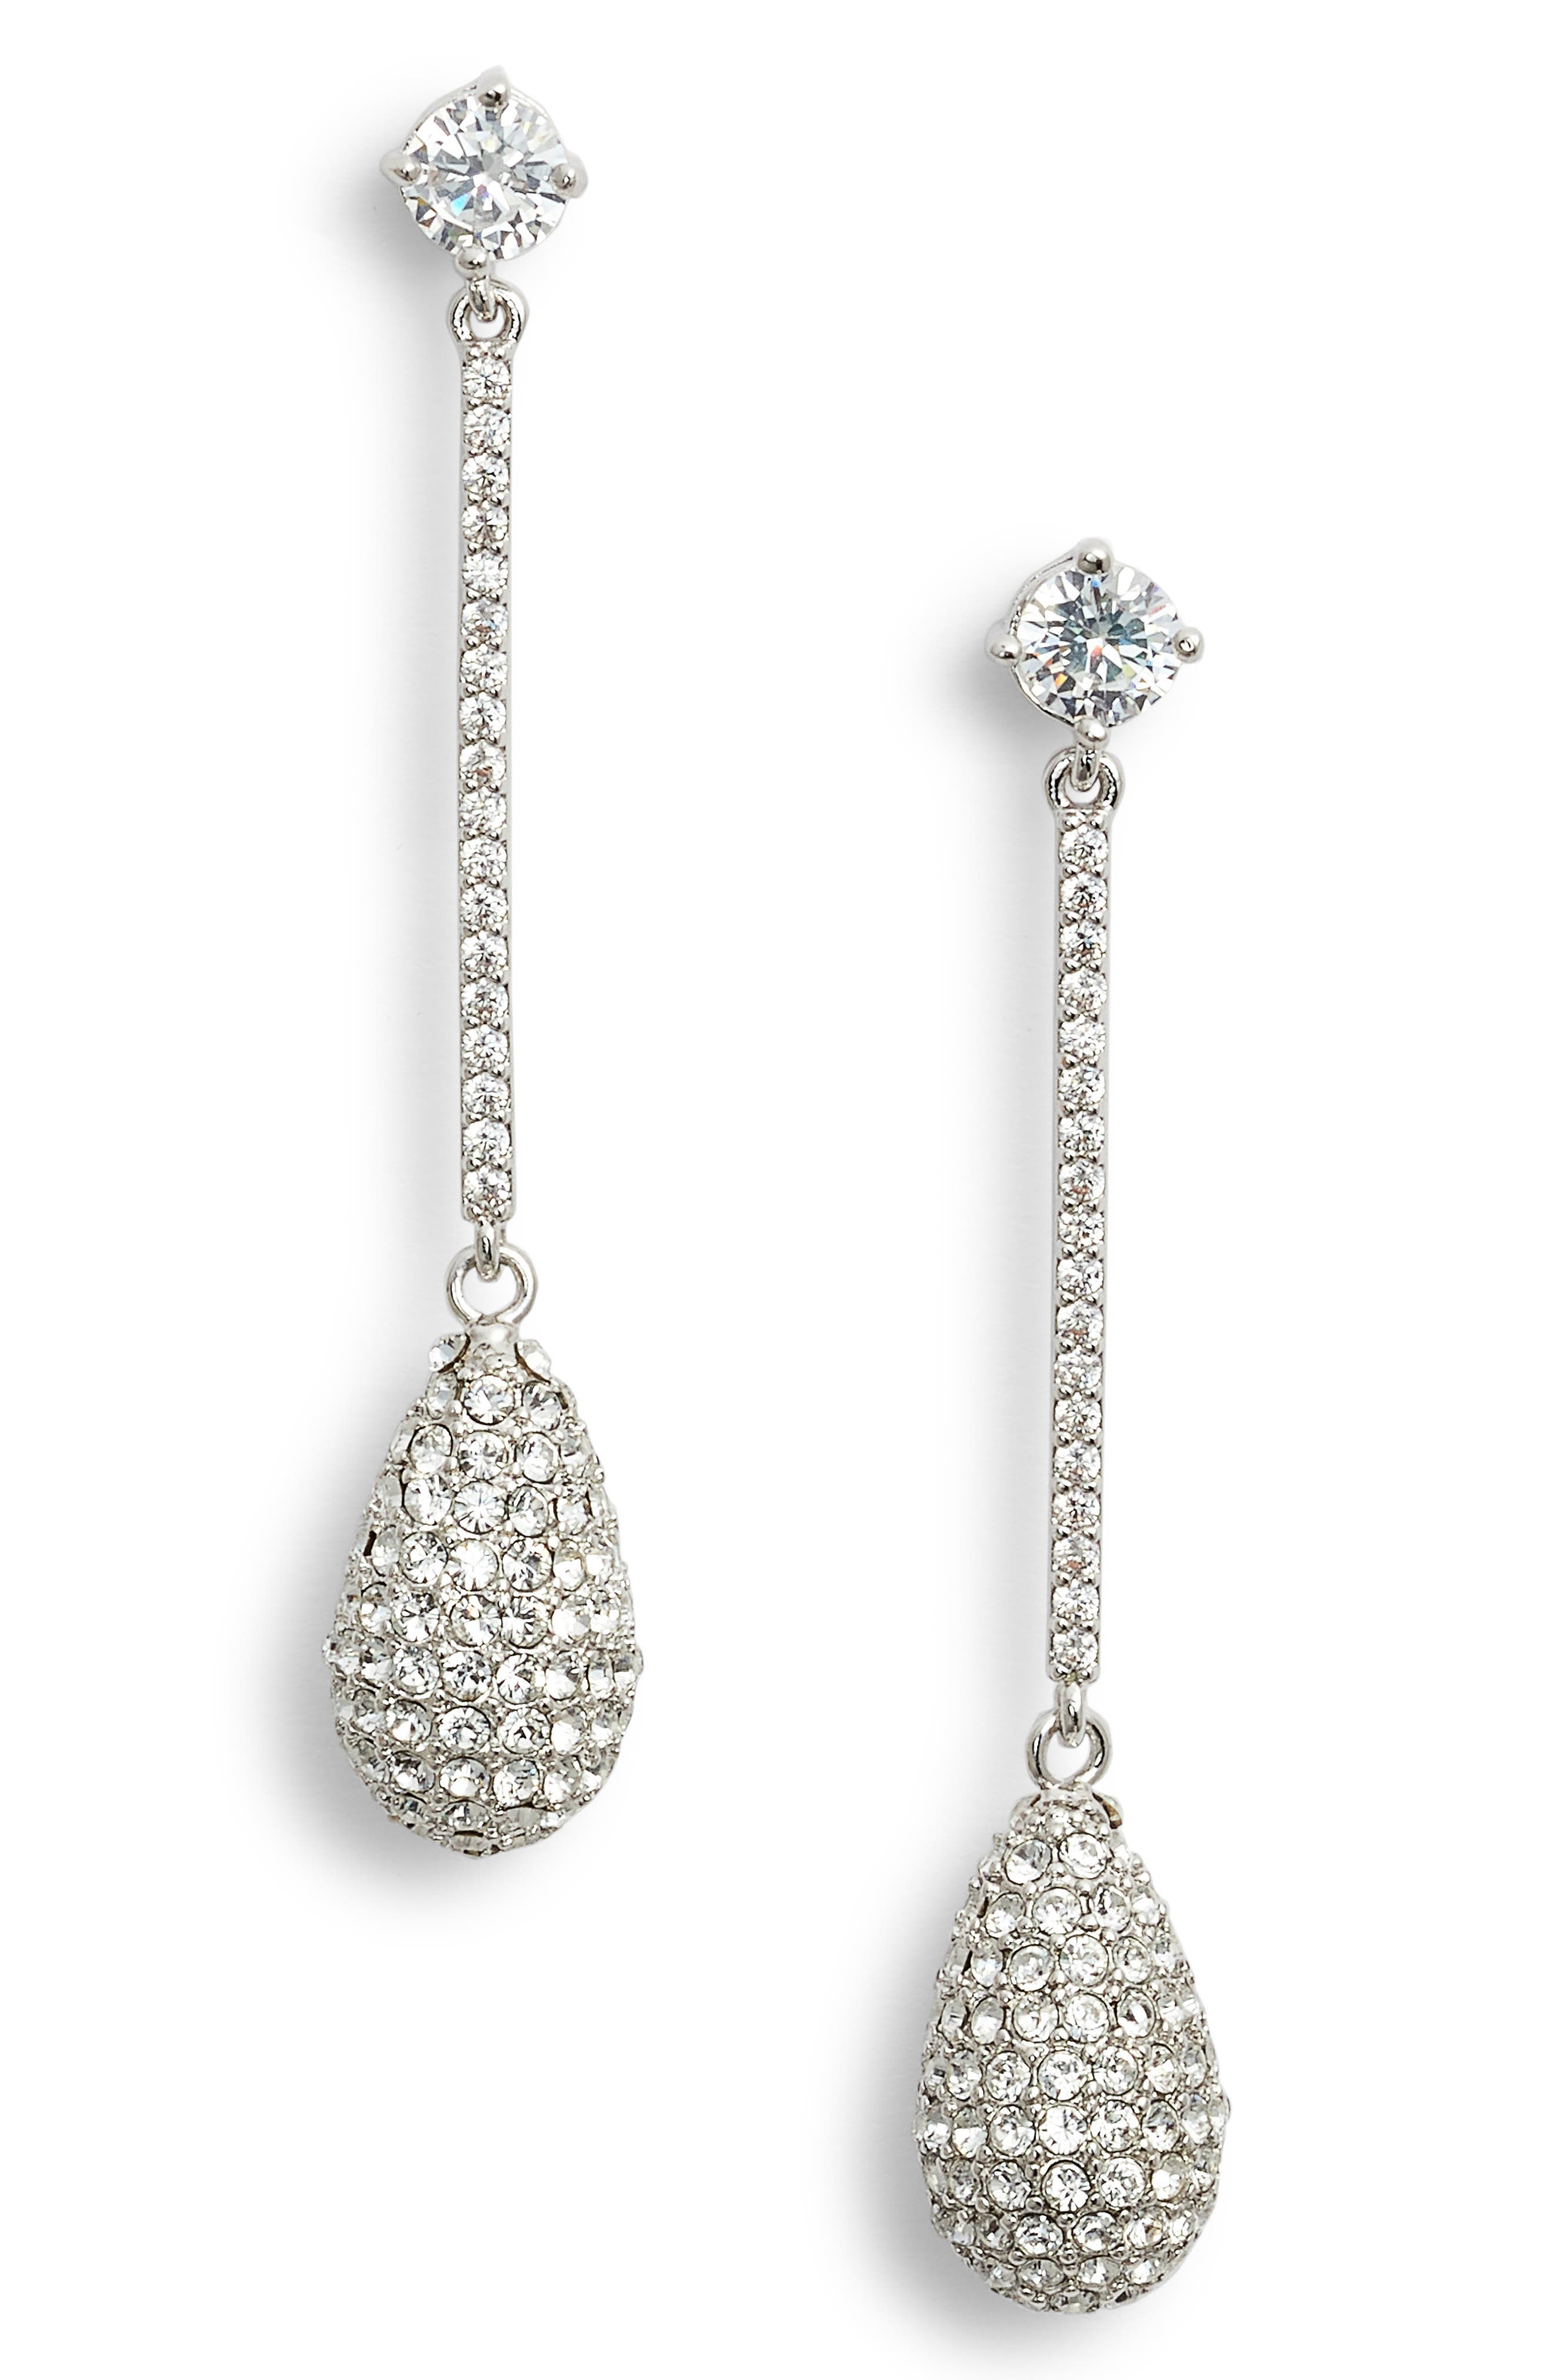 Swarovski Crystal Teardrop Earrings,                             Main thumbnail 1, color,                             WHITE/ SILVER